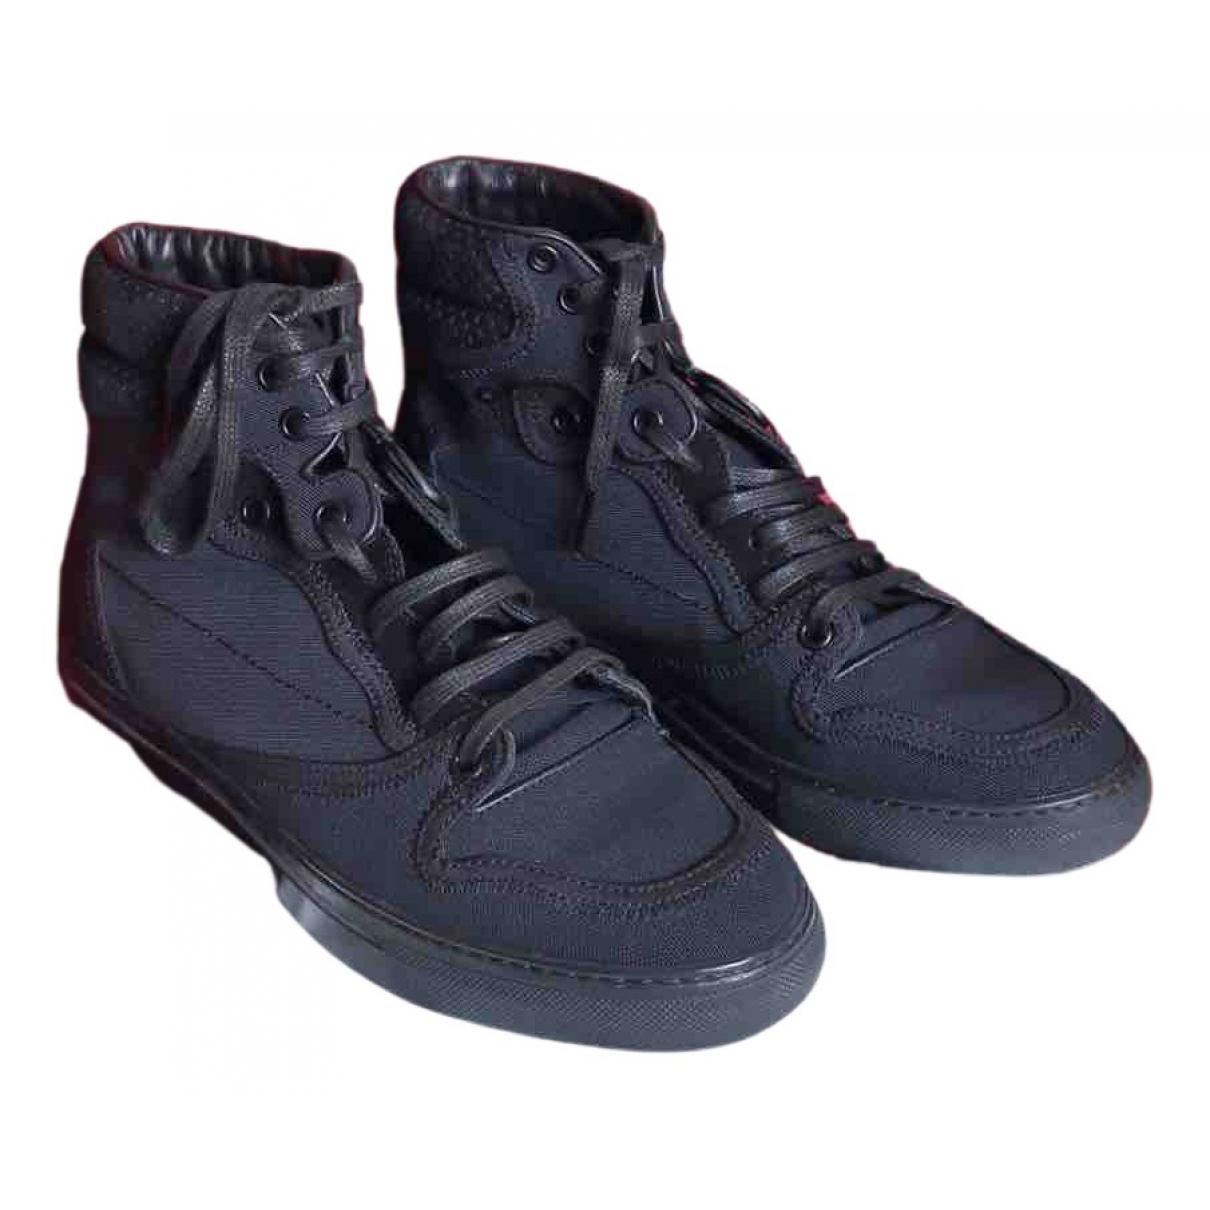 Balenciaga \N Sneakers in  Schwarz Leinen